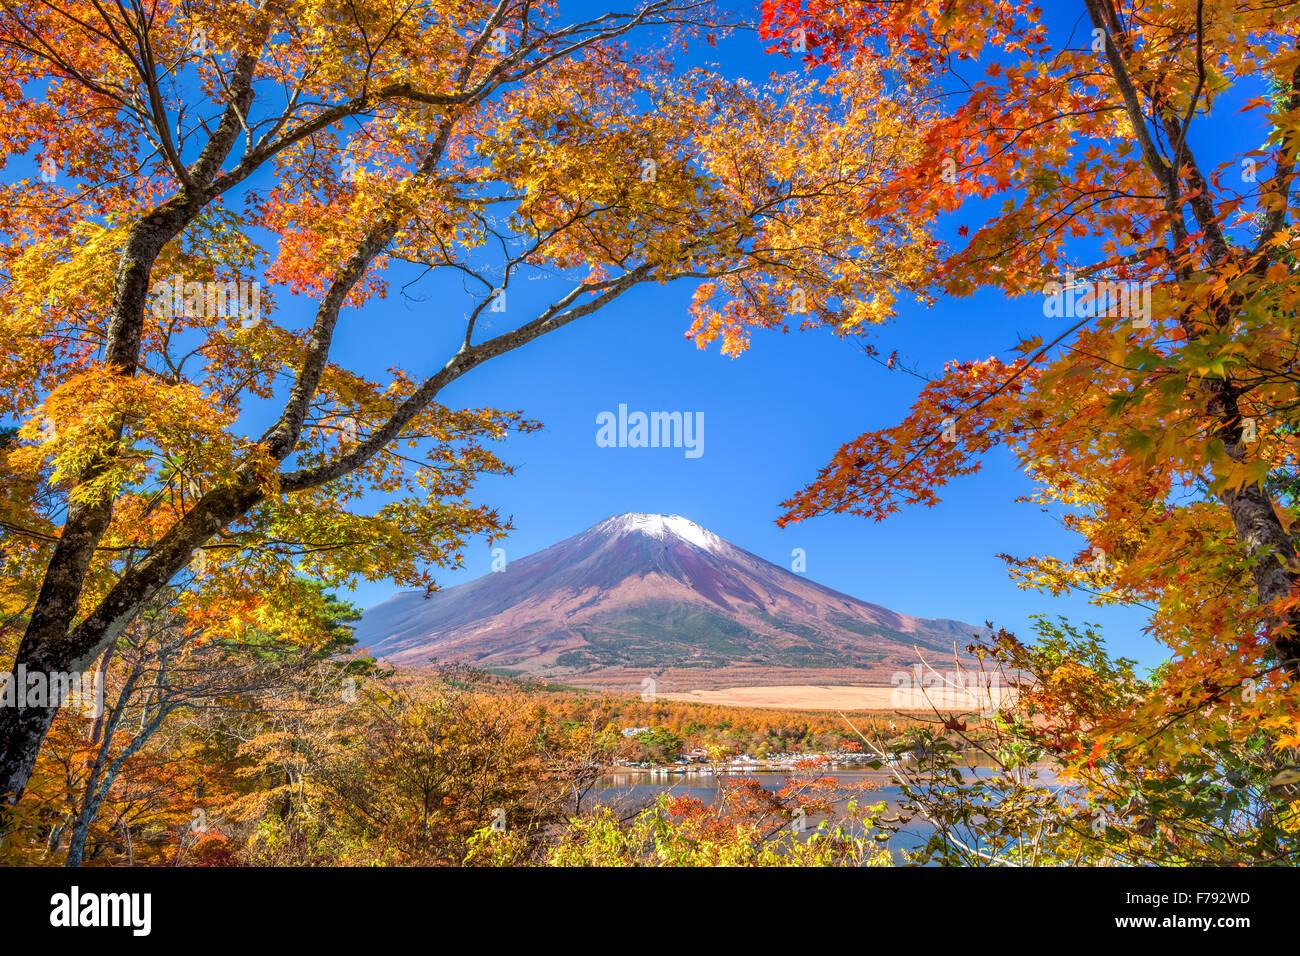 Mt. Fuji, Japan from Yamanaka Lake in autumn. Stock Photo